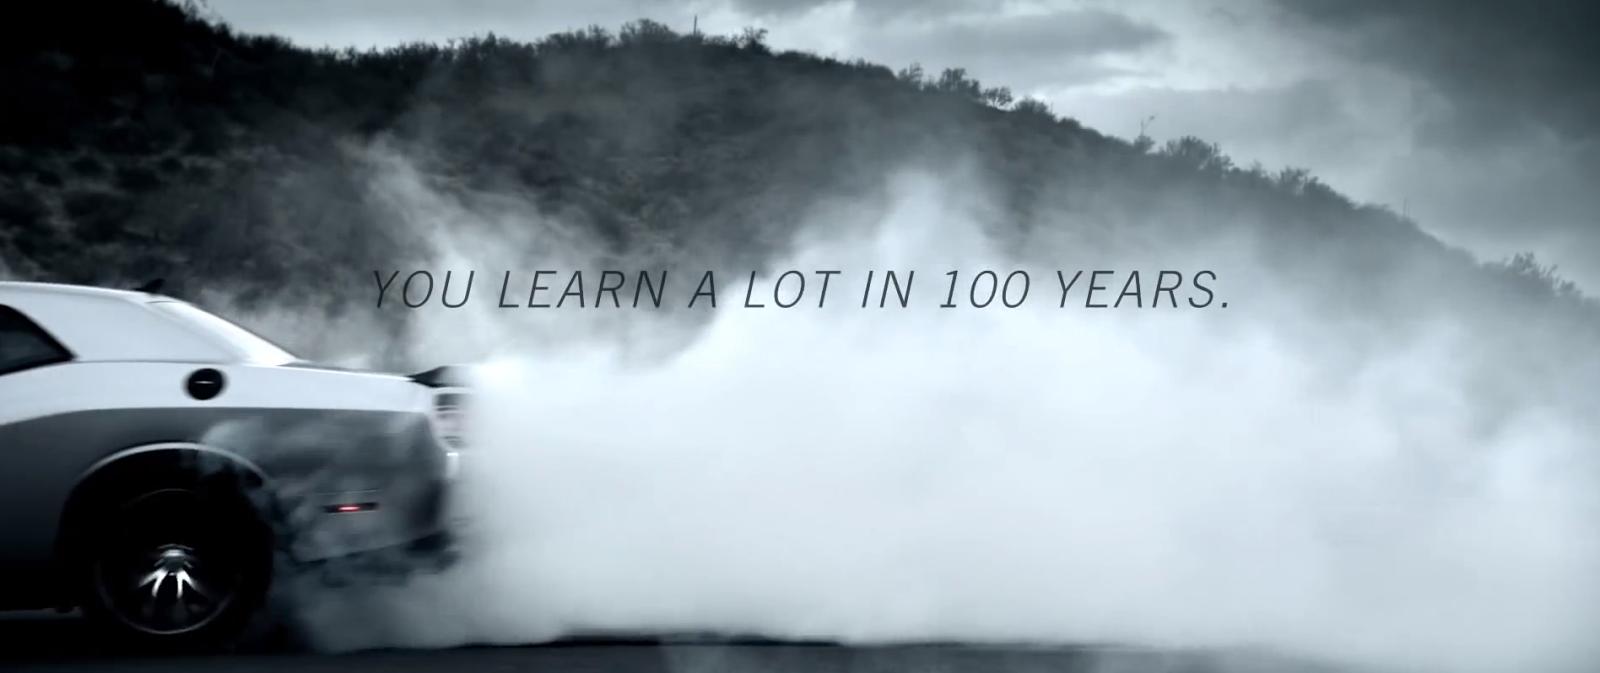 2015 Dodge super bowl commercial screenshot